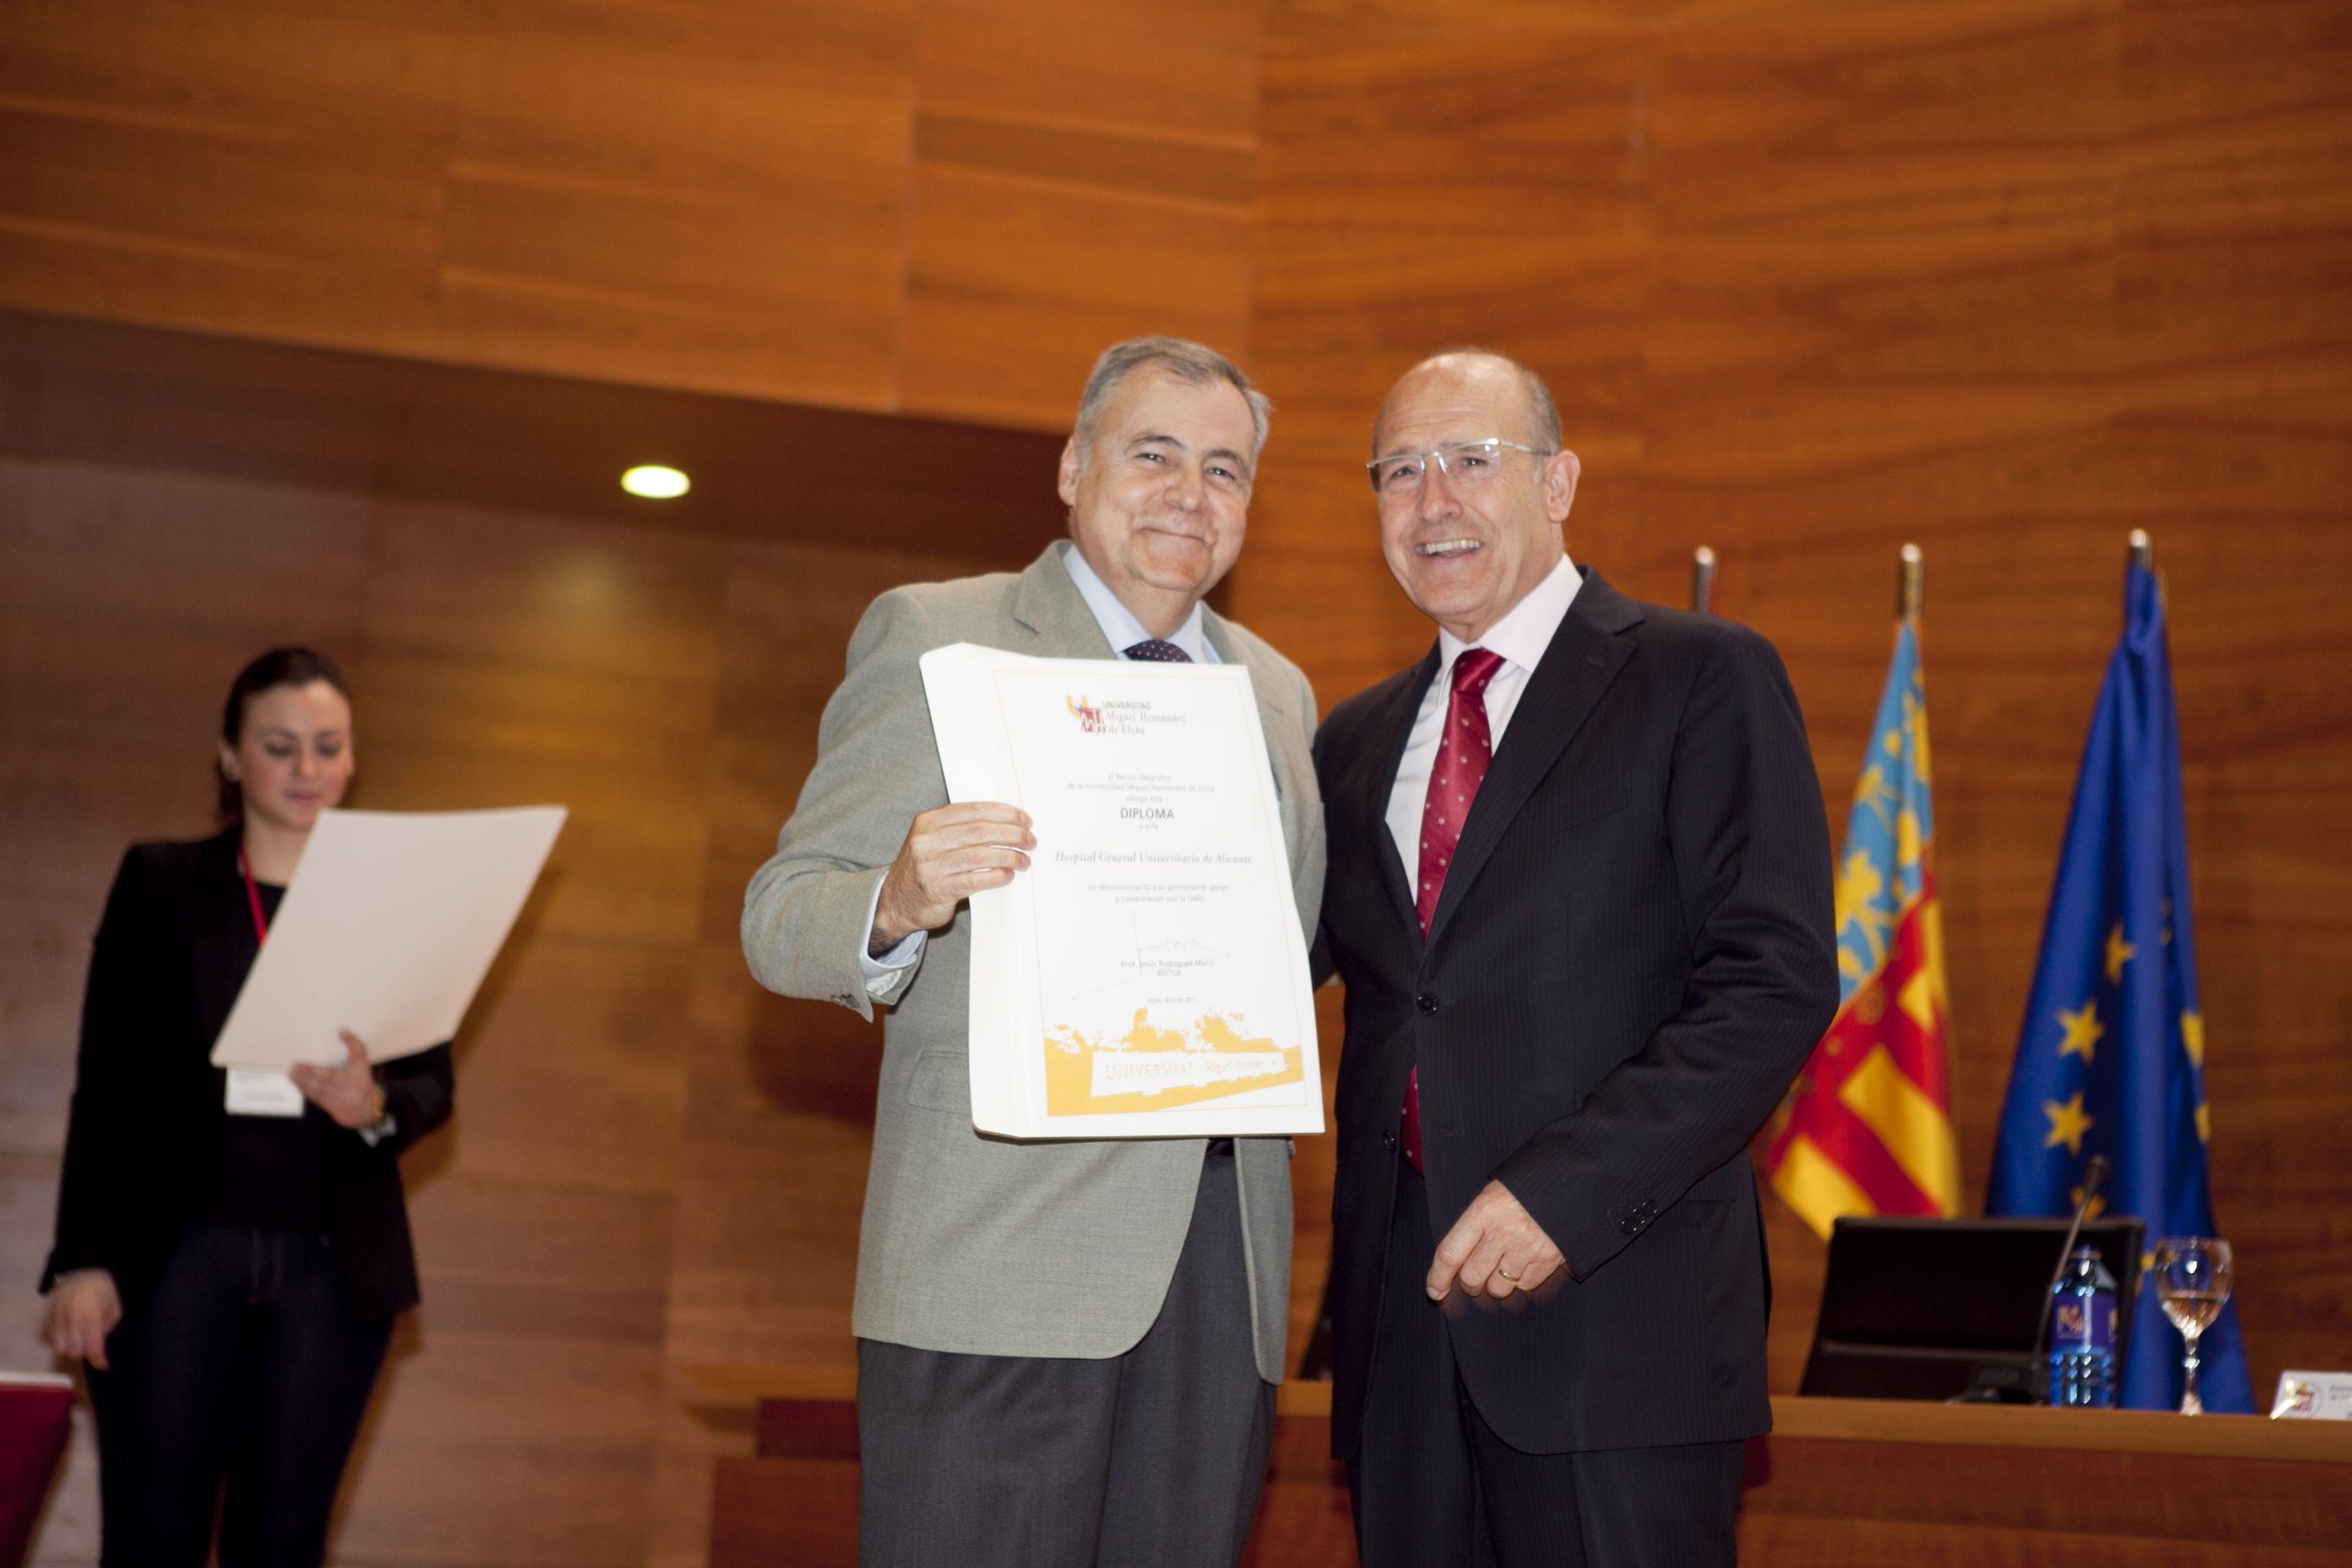 umh-diplomas-rector_mg_6973.jpg